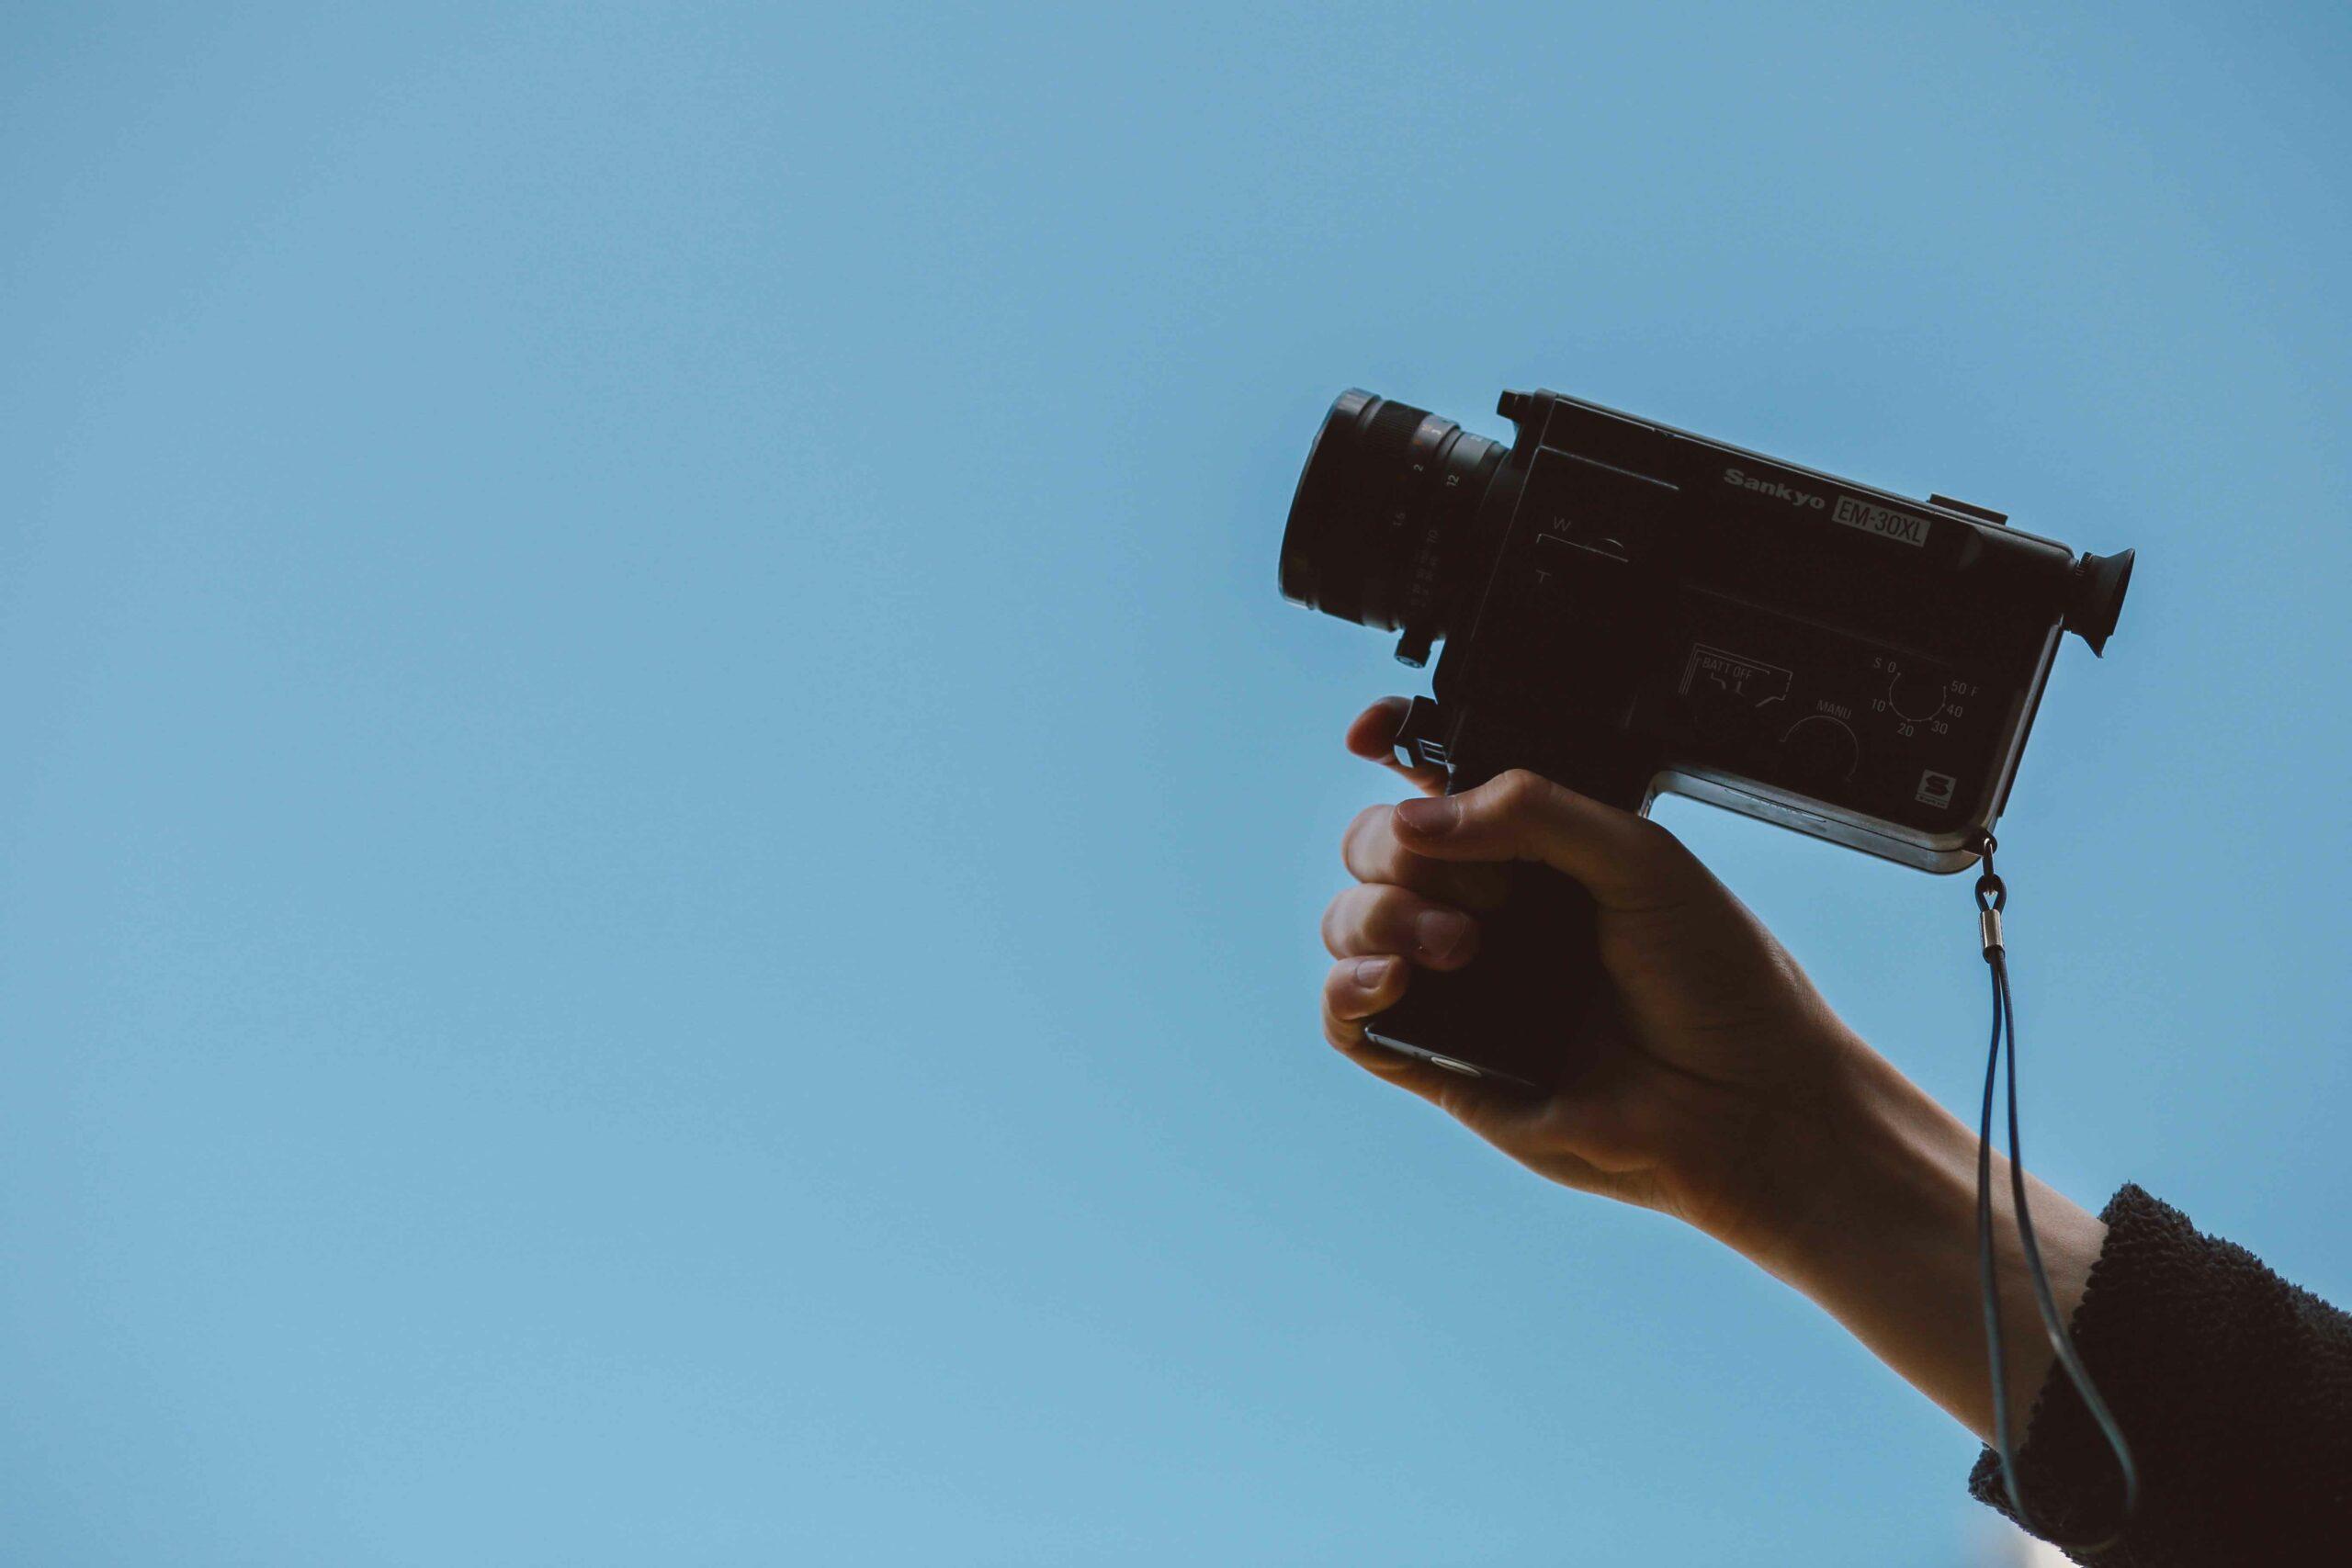 Super 8 Film-Kamera/ Filmformat, Filmkamera